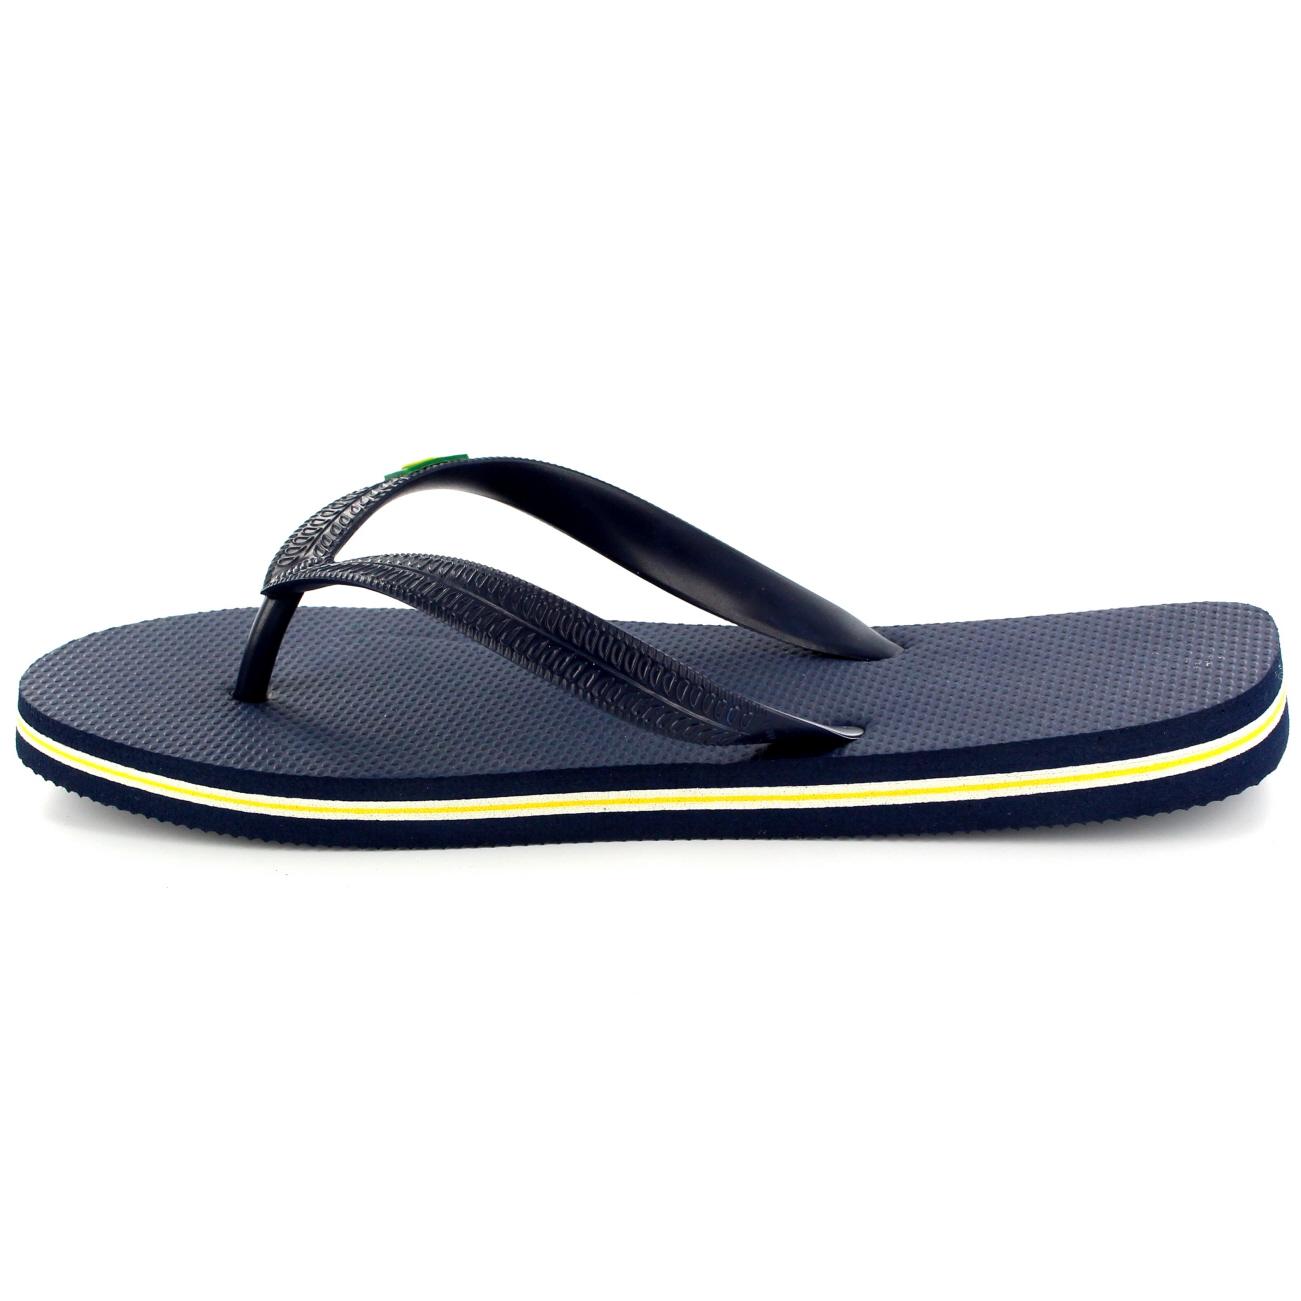 Sandals shoes holidays - Mens Brazil Logo Beach Summer Brasil Holiday Sandals